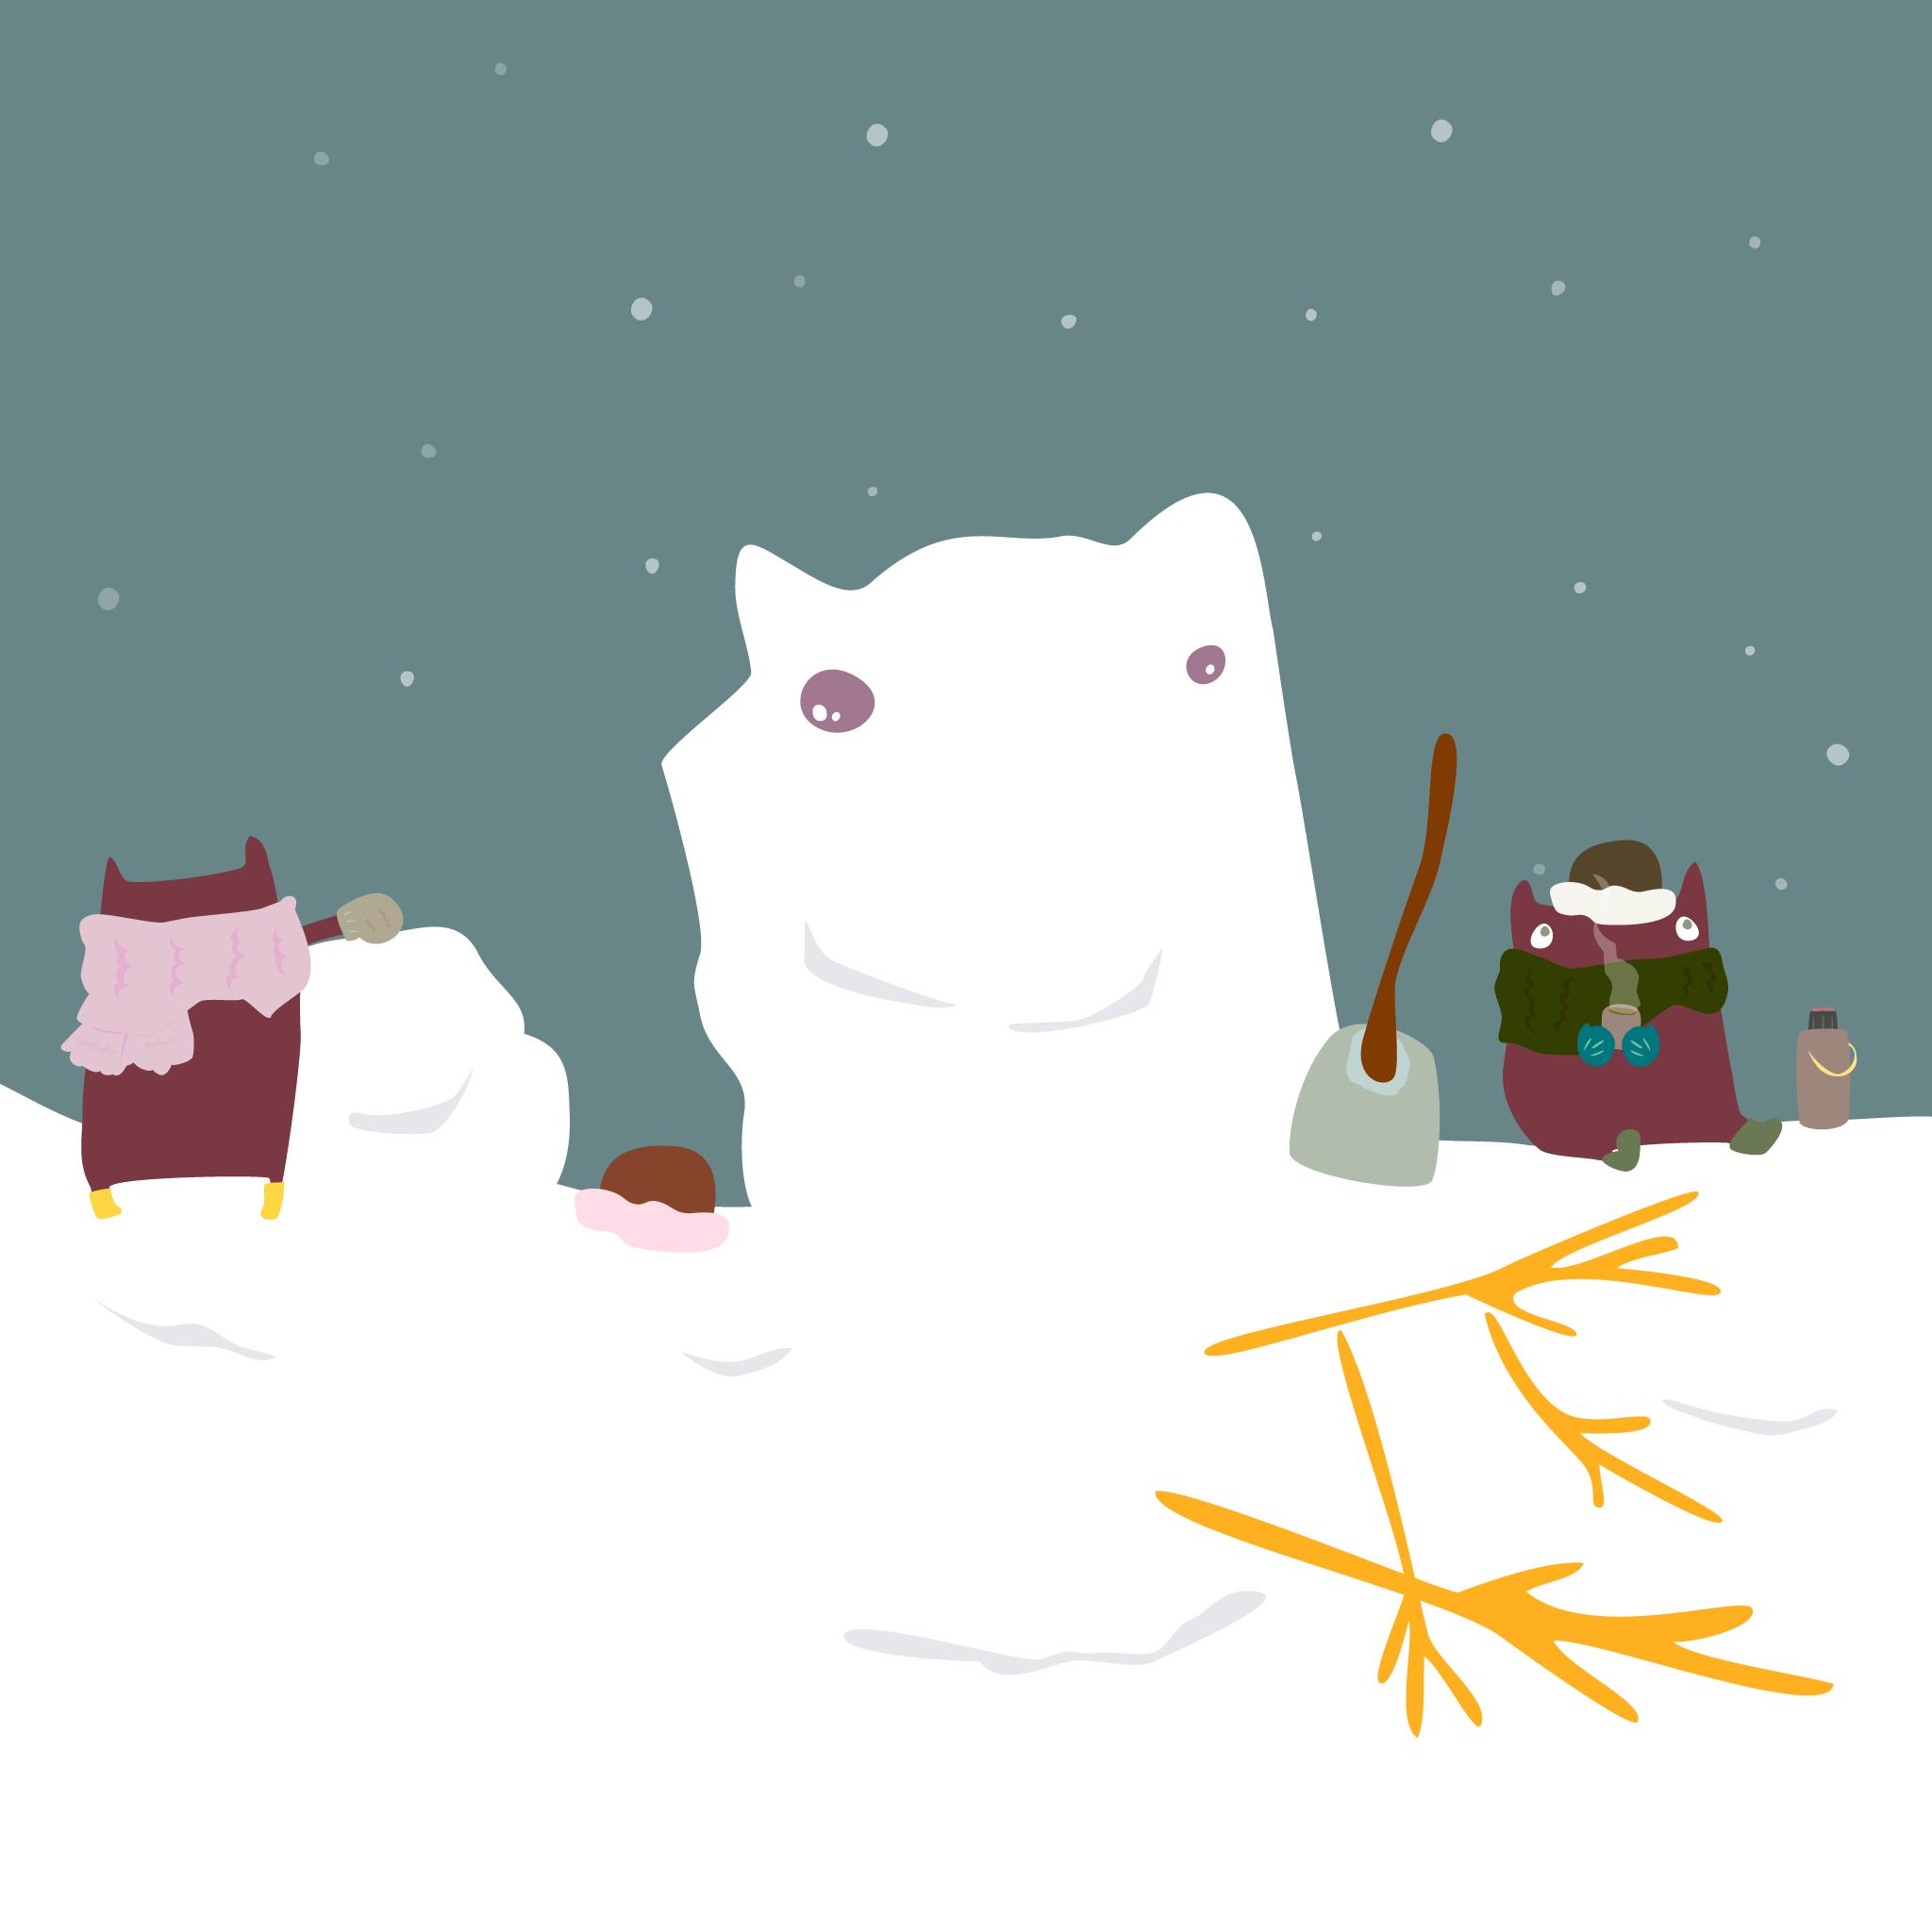 [winter16wp][2048x2048]